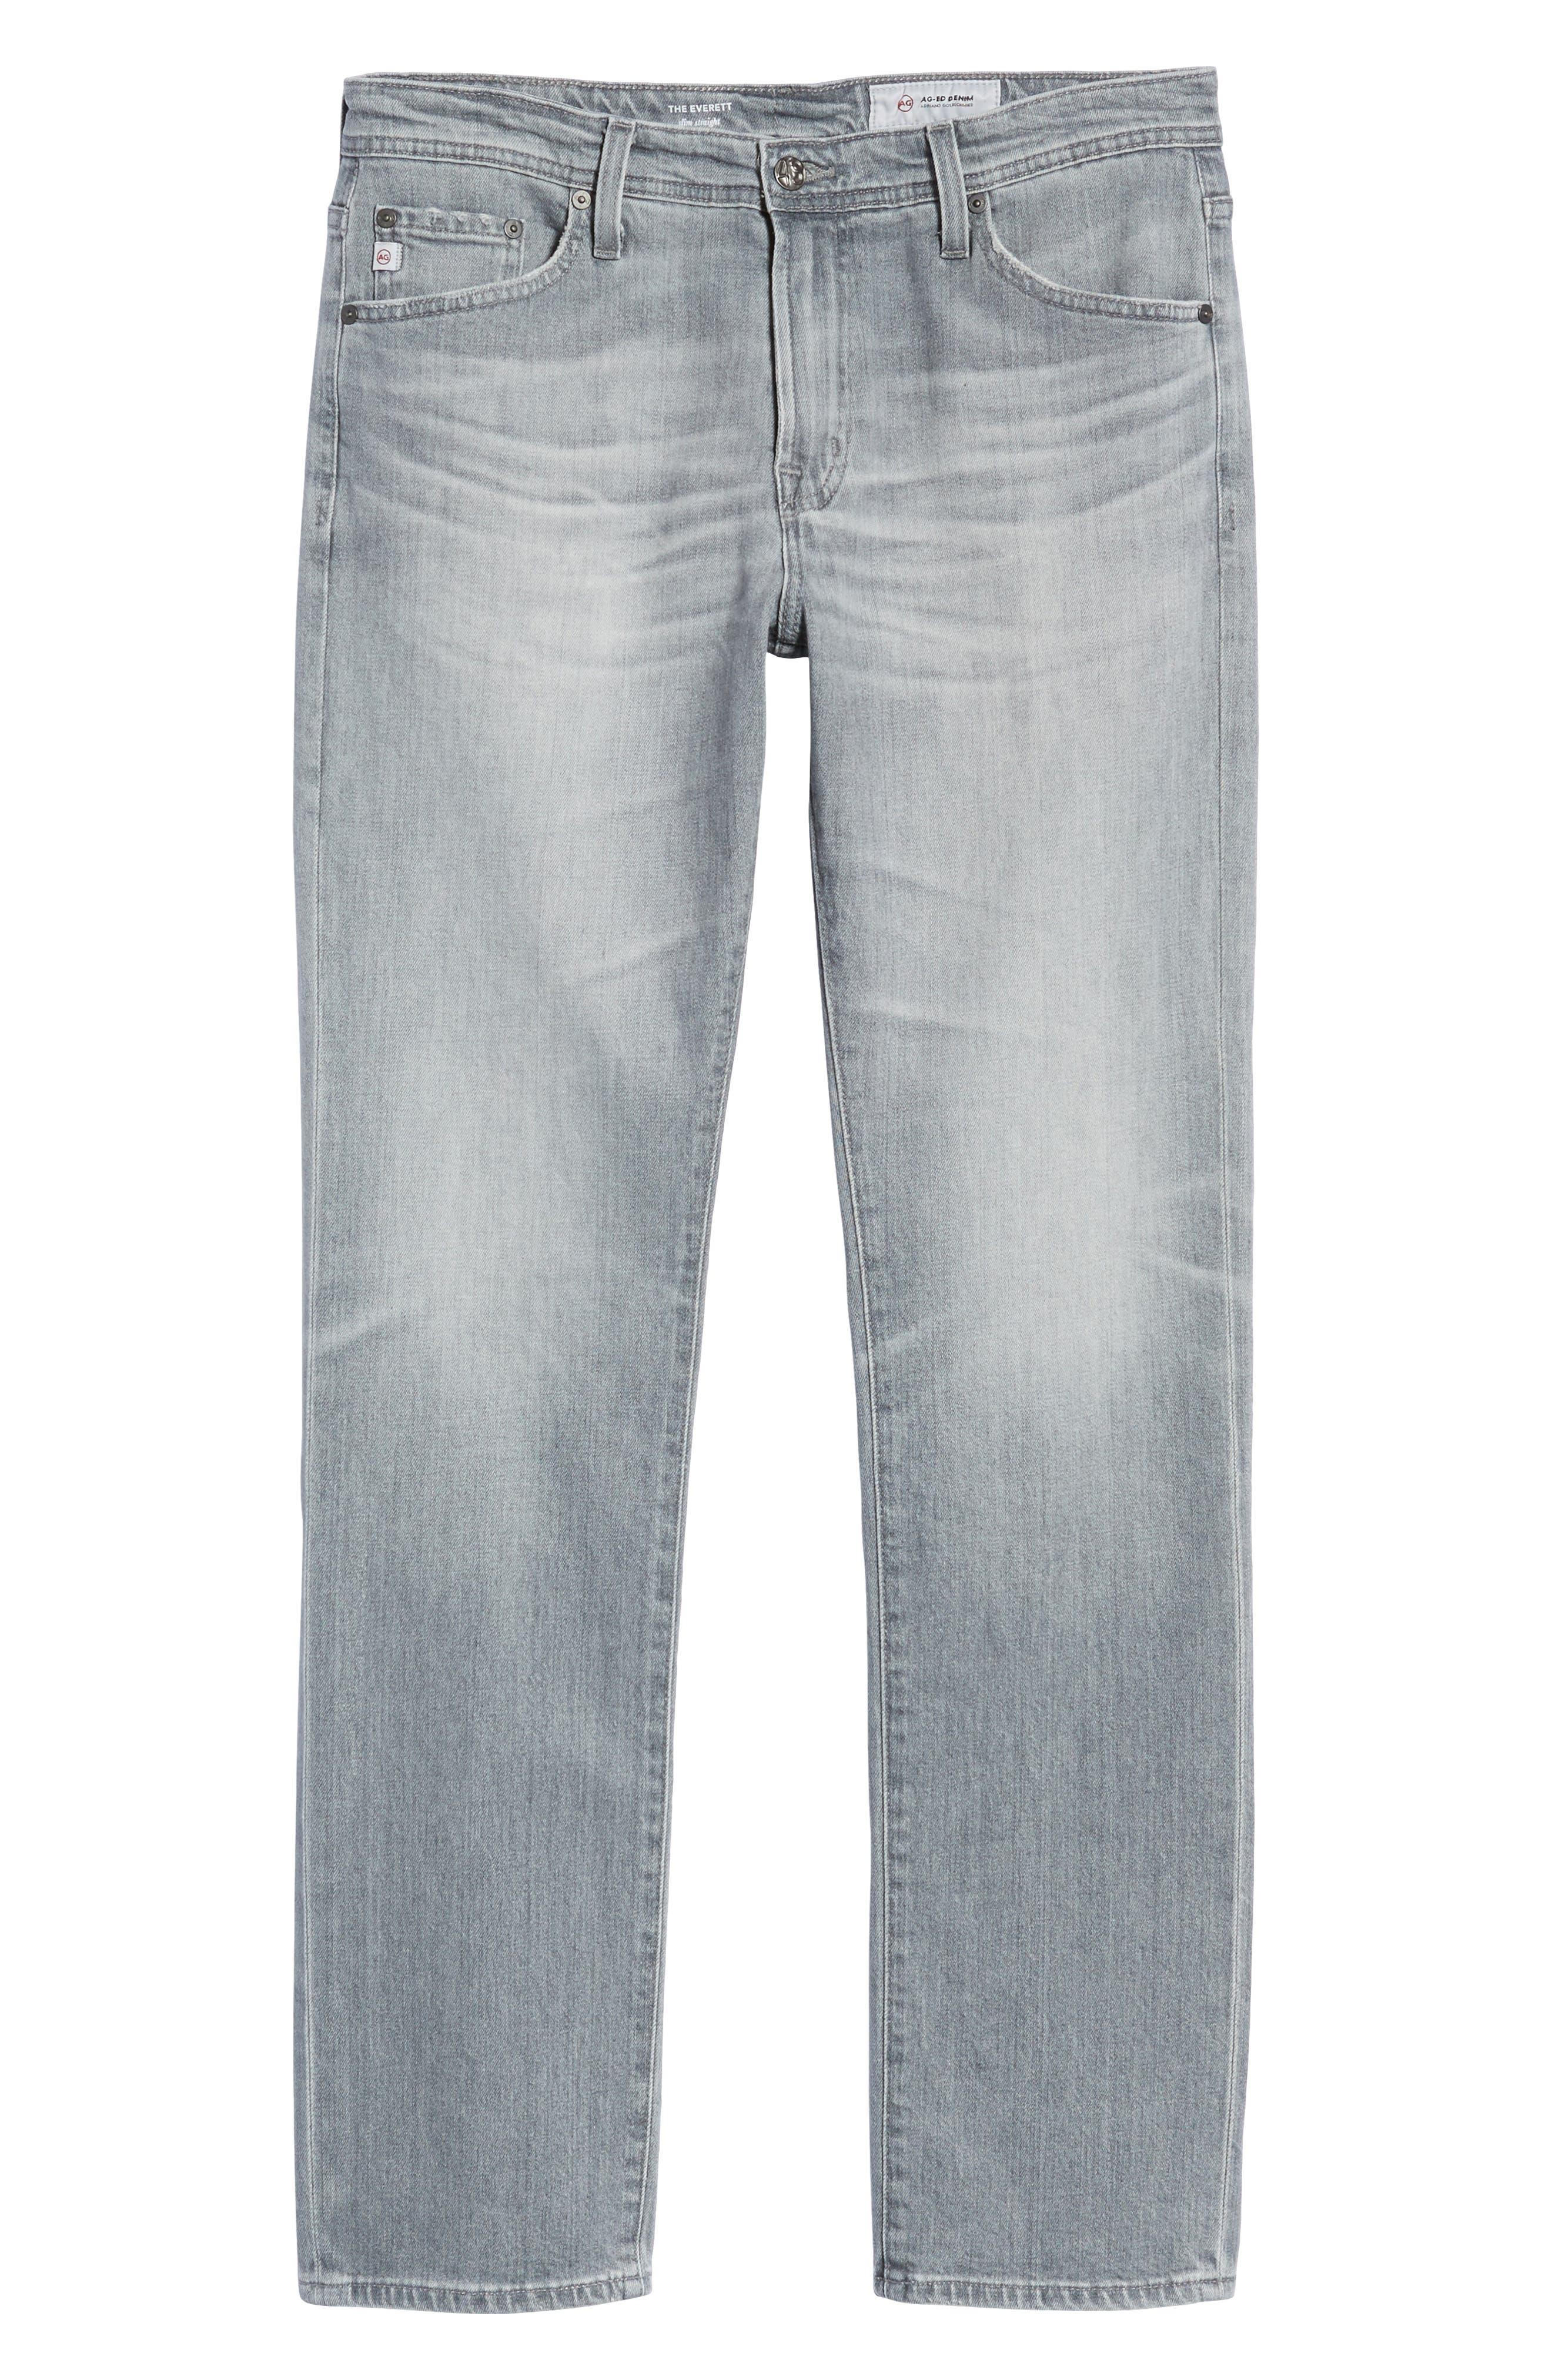 Everett Slim Straight Fit Jeans,                             Alternate thumbnail 6, color,